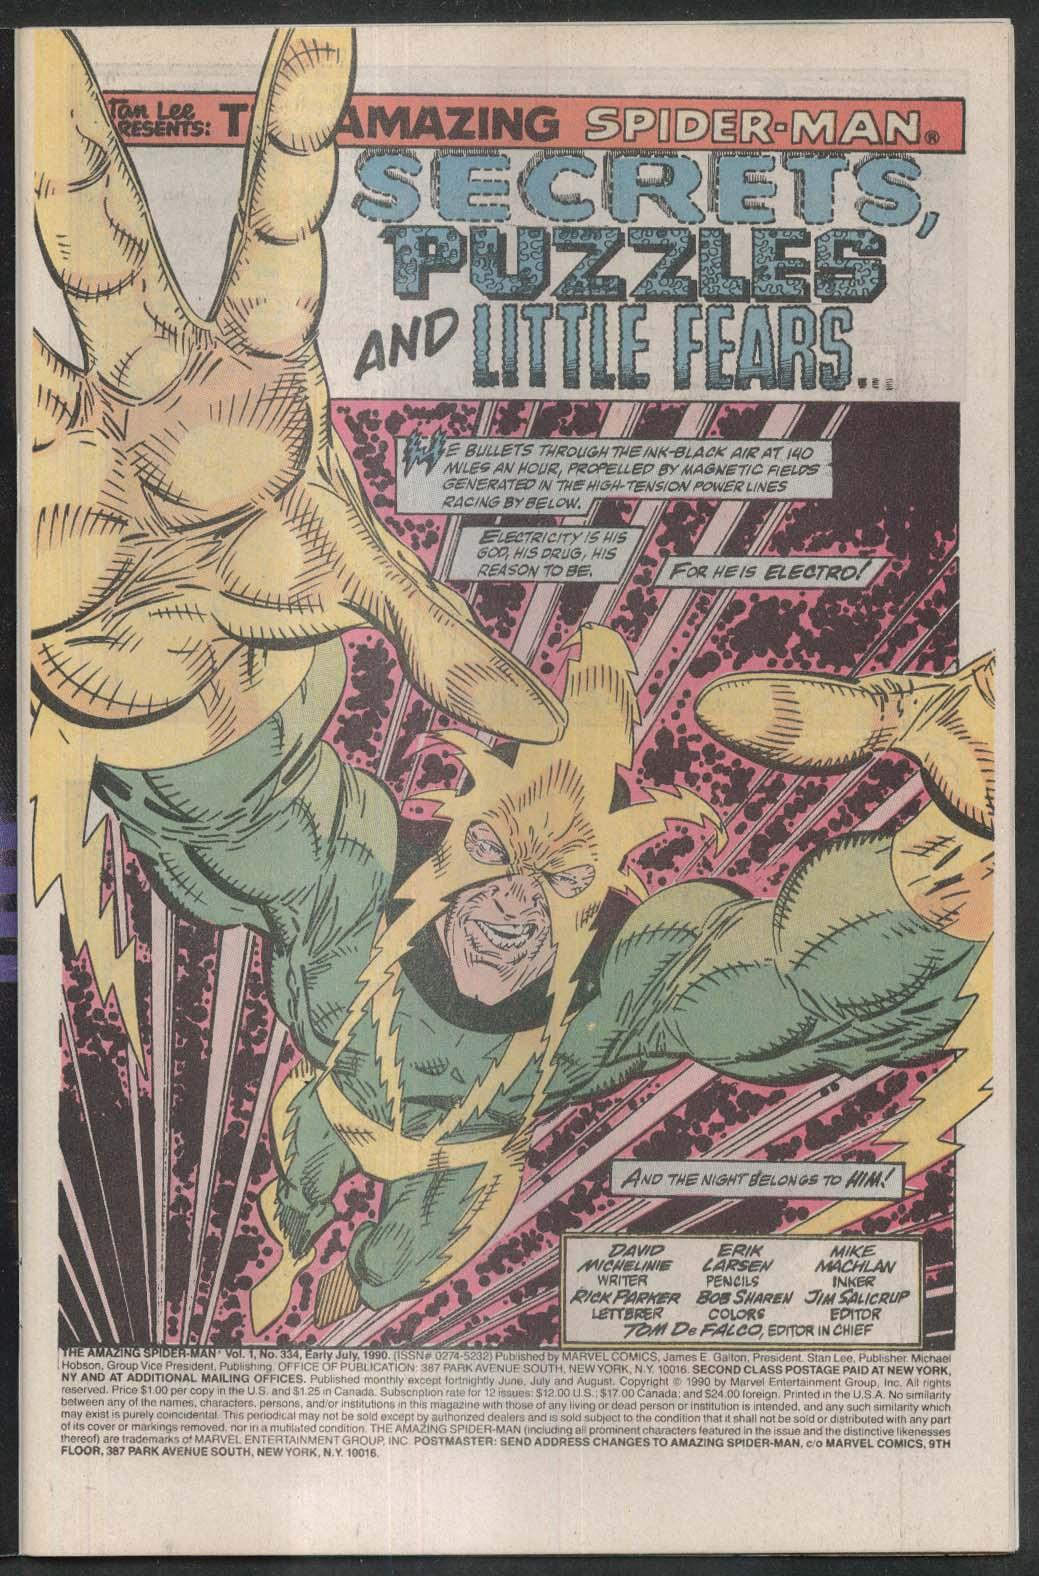 AMAZING SPIDER-MAN #334 Marvel comic book 7 1990 Electro